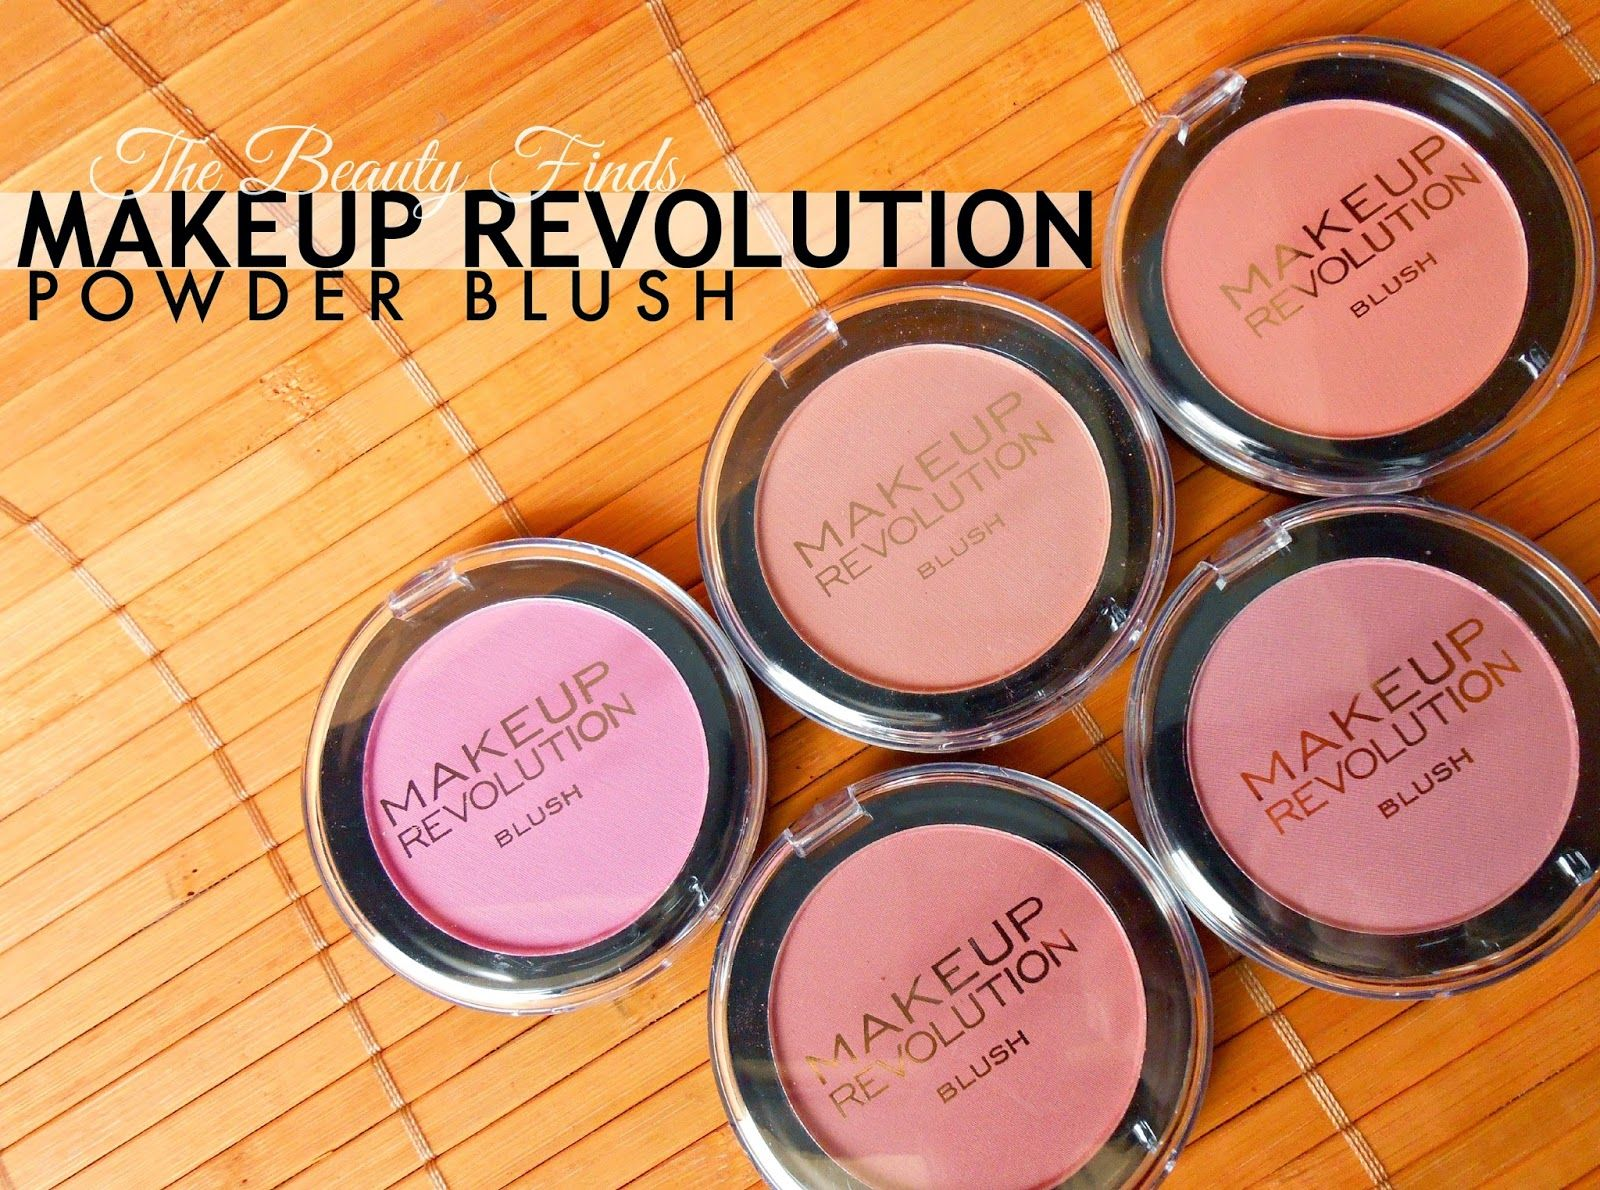 Makeup Revolution POWDER Blush swatches Makeup